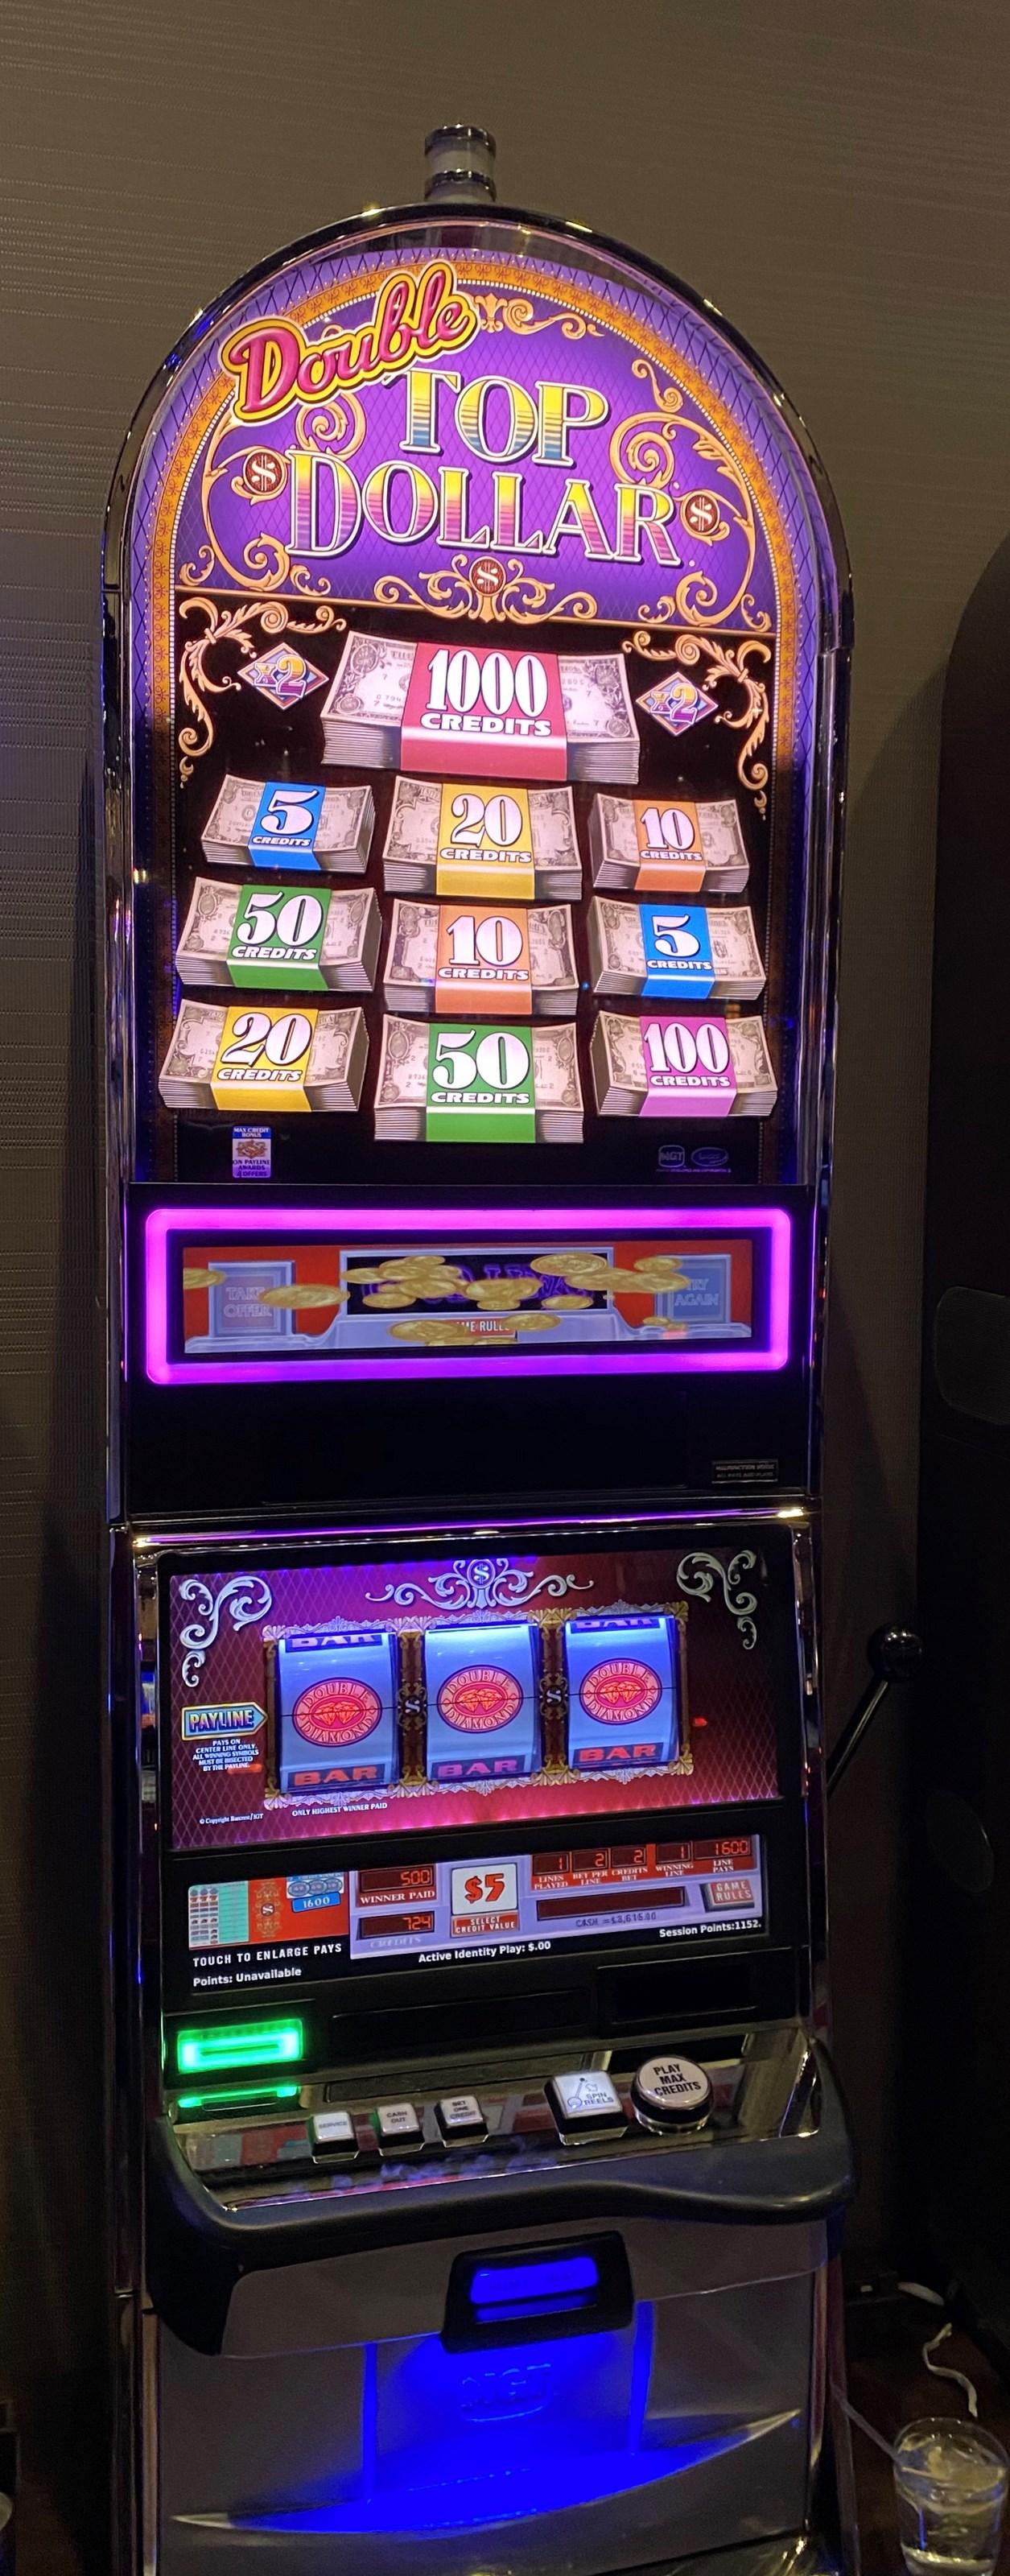 Igt Slot Machine Not Reading Dollars